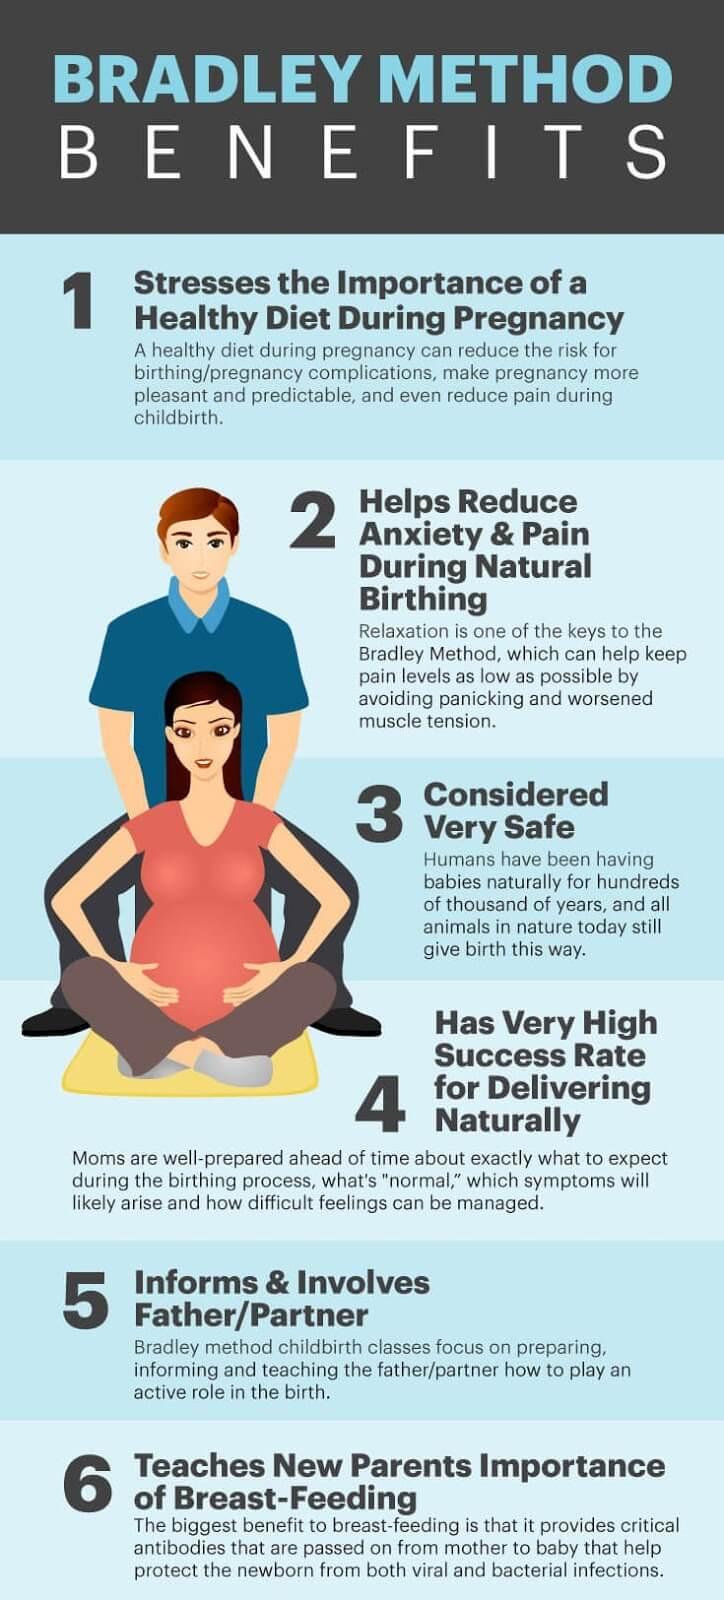 bradley method, Lamaze Classes, Natural Birth, Natural Childbirth, The Bradley Method